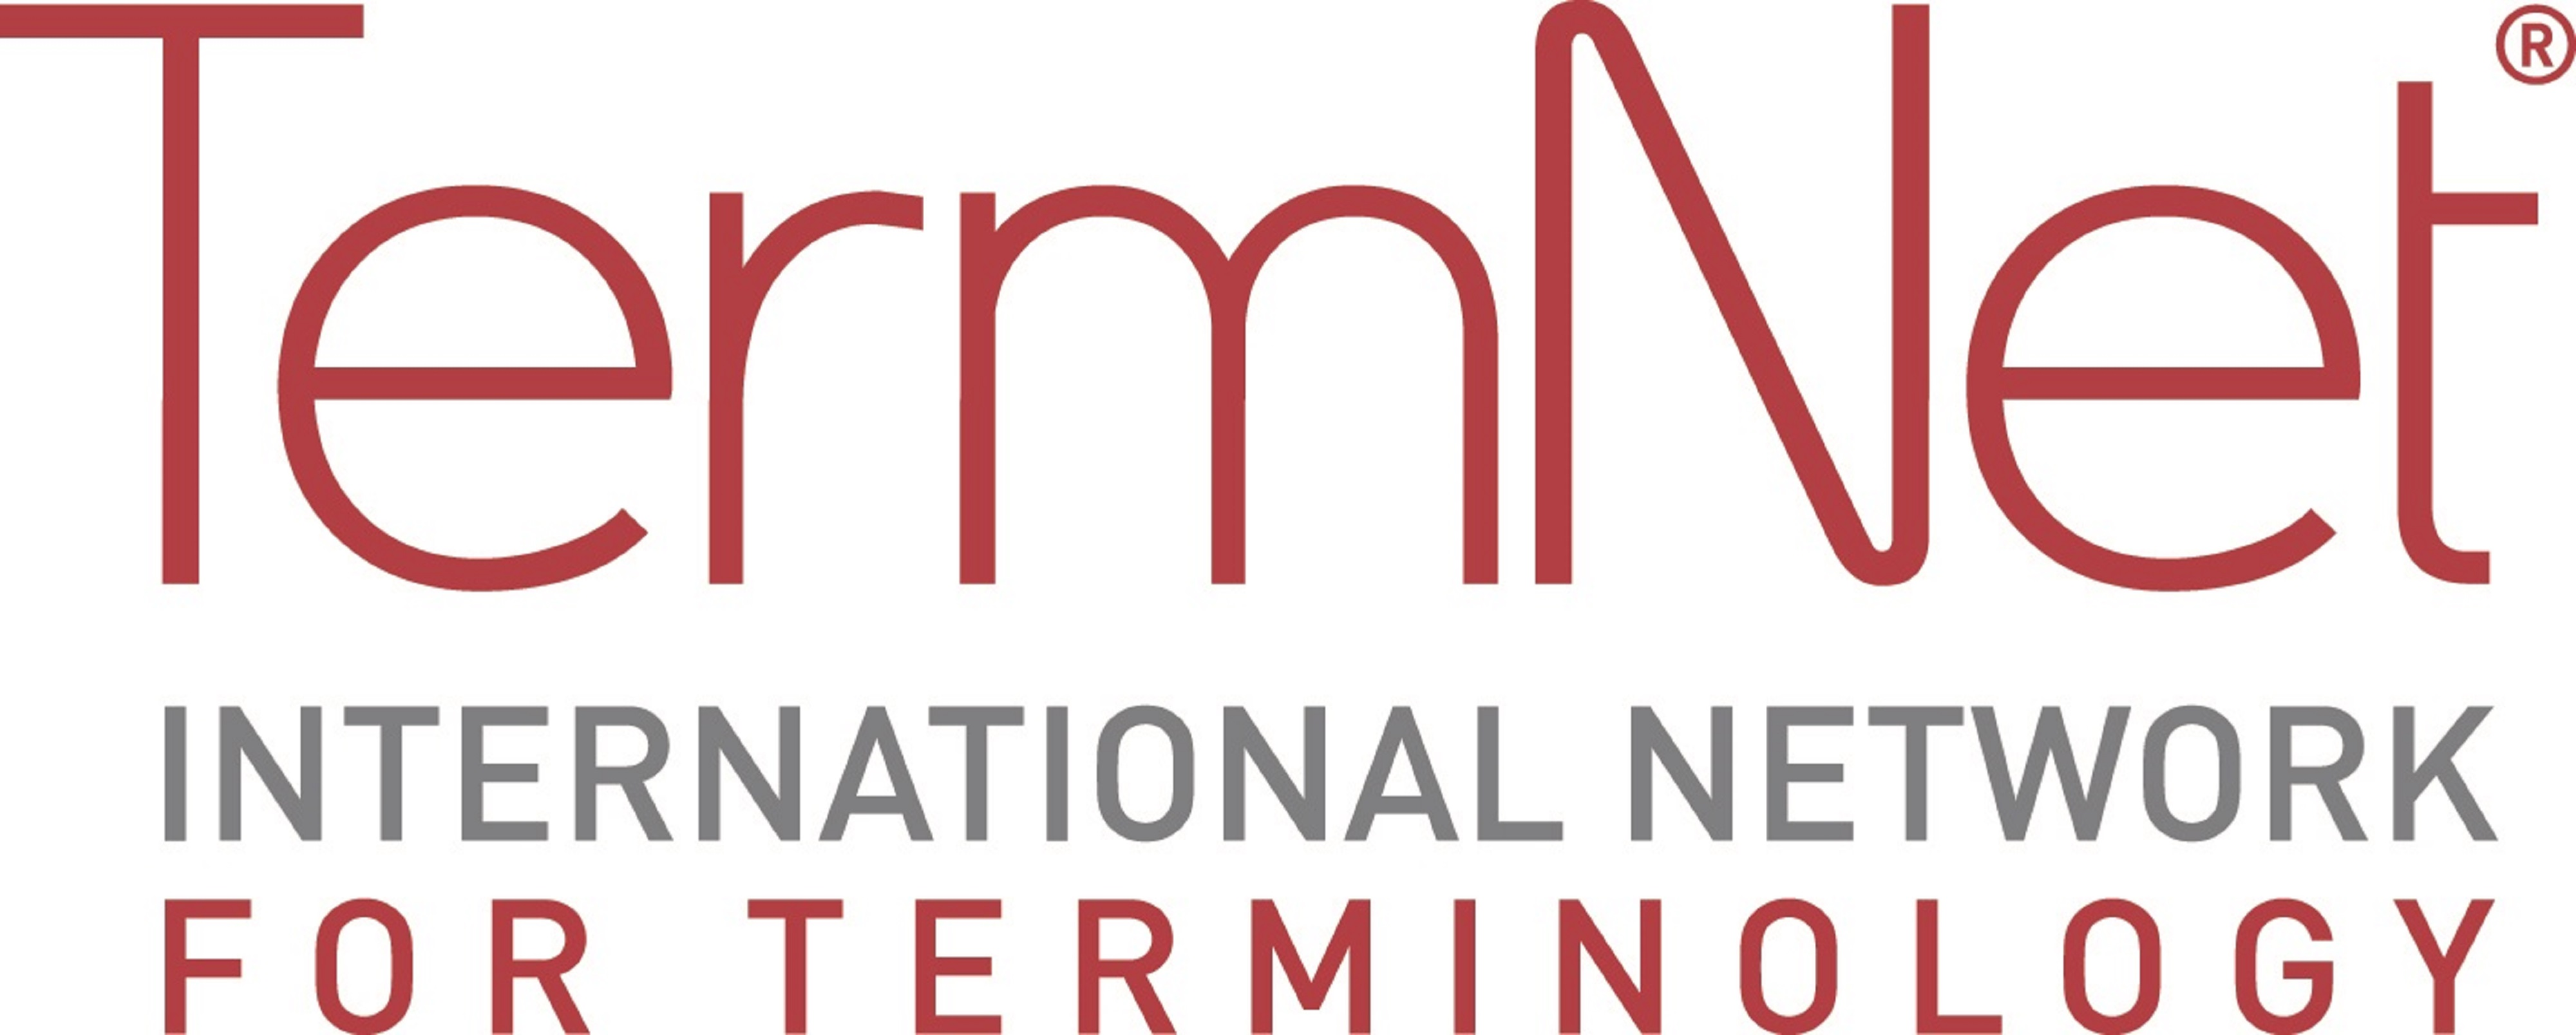 TermNet's Terminology Trainings